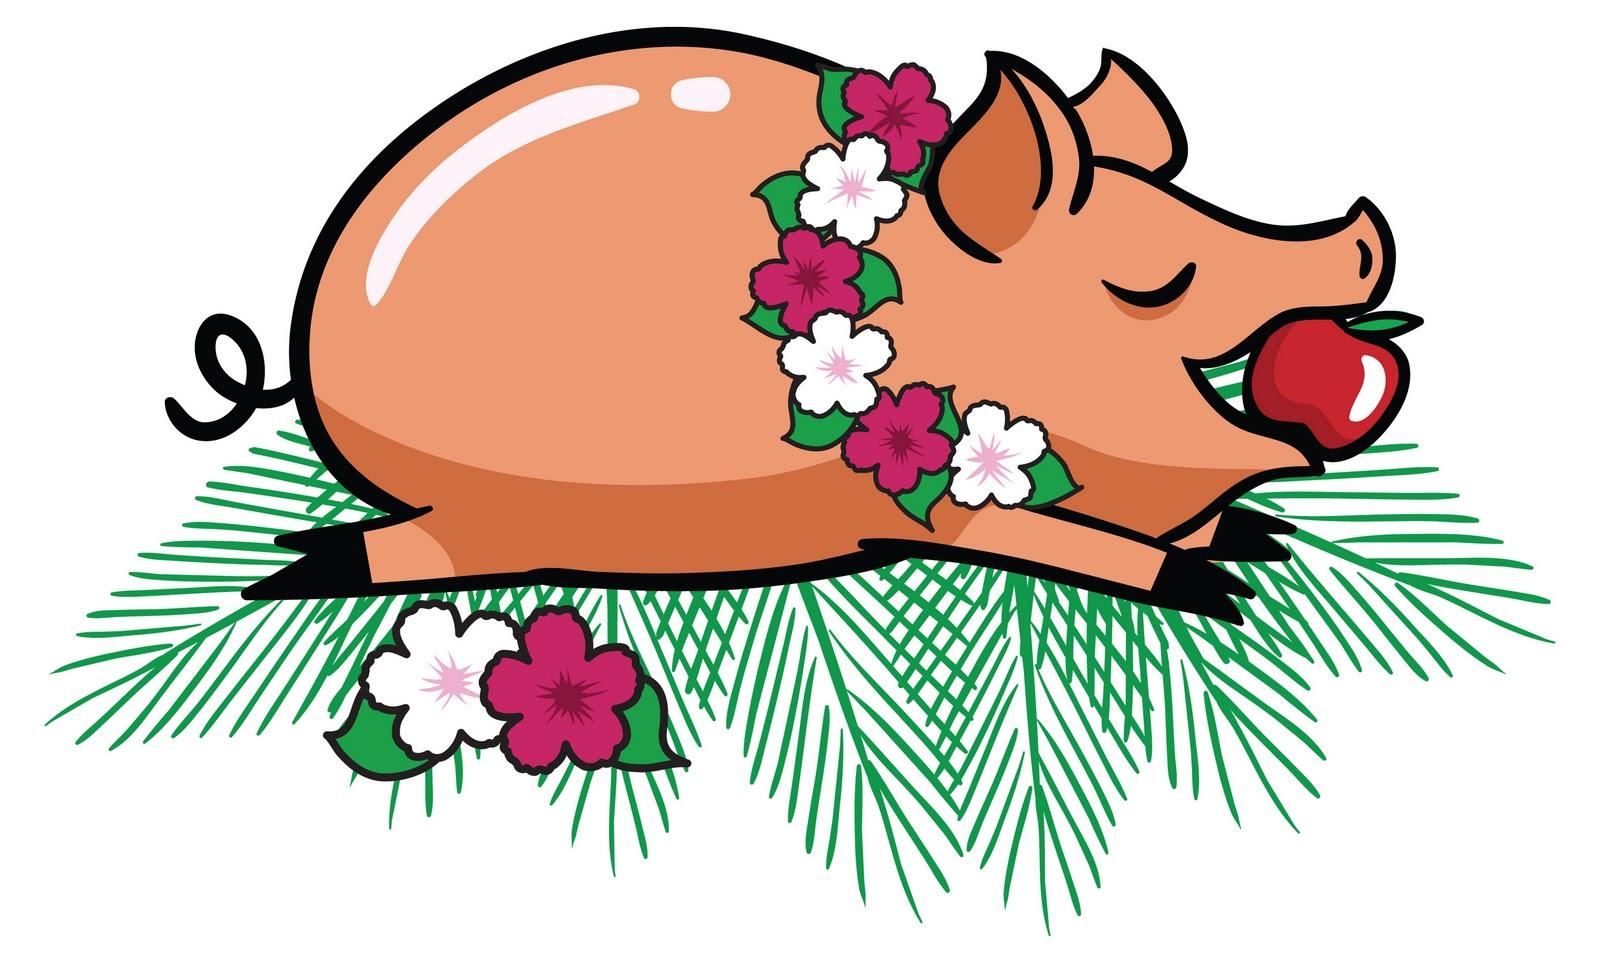 Clip Art Pig Roast Clip Art pig roast clipart kid luau clip art black and white panda free images